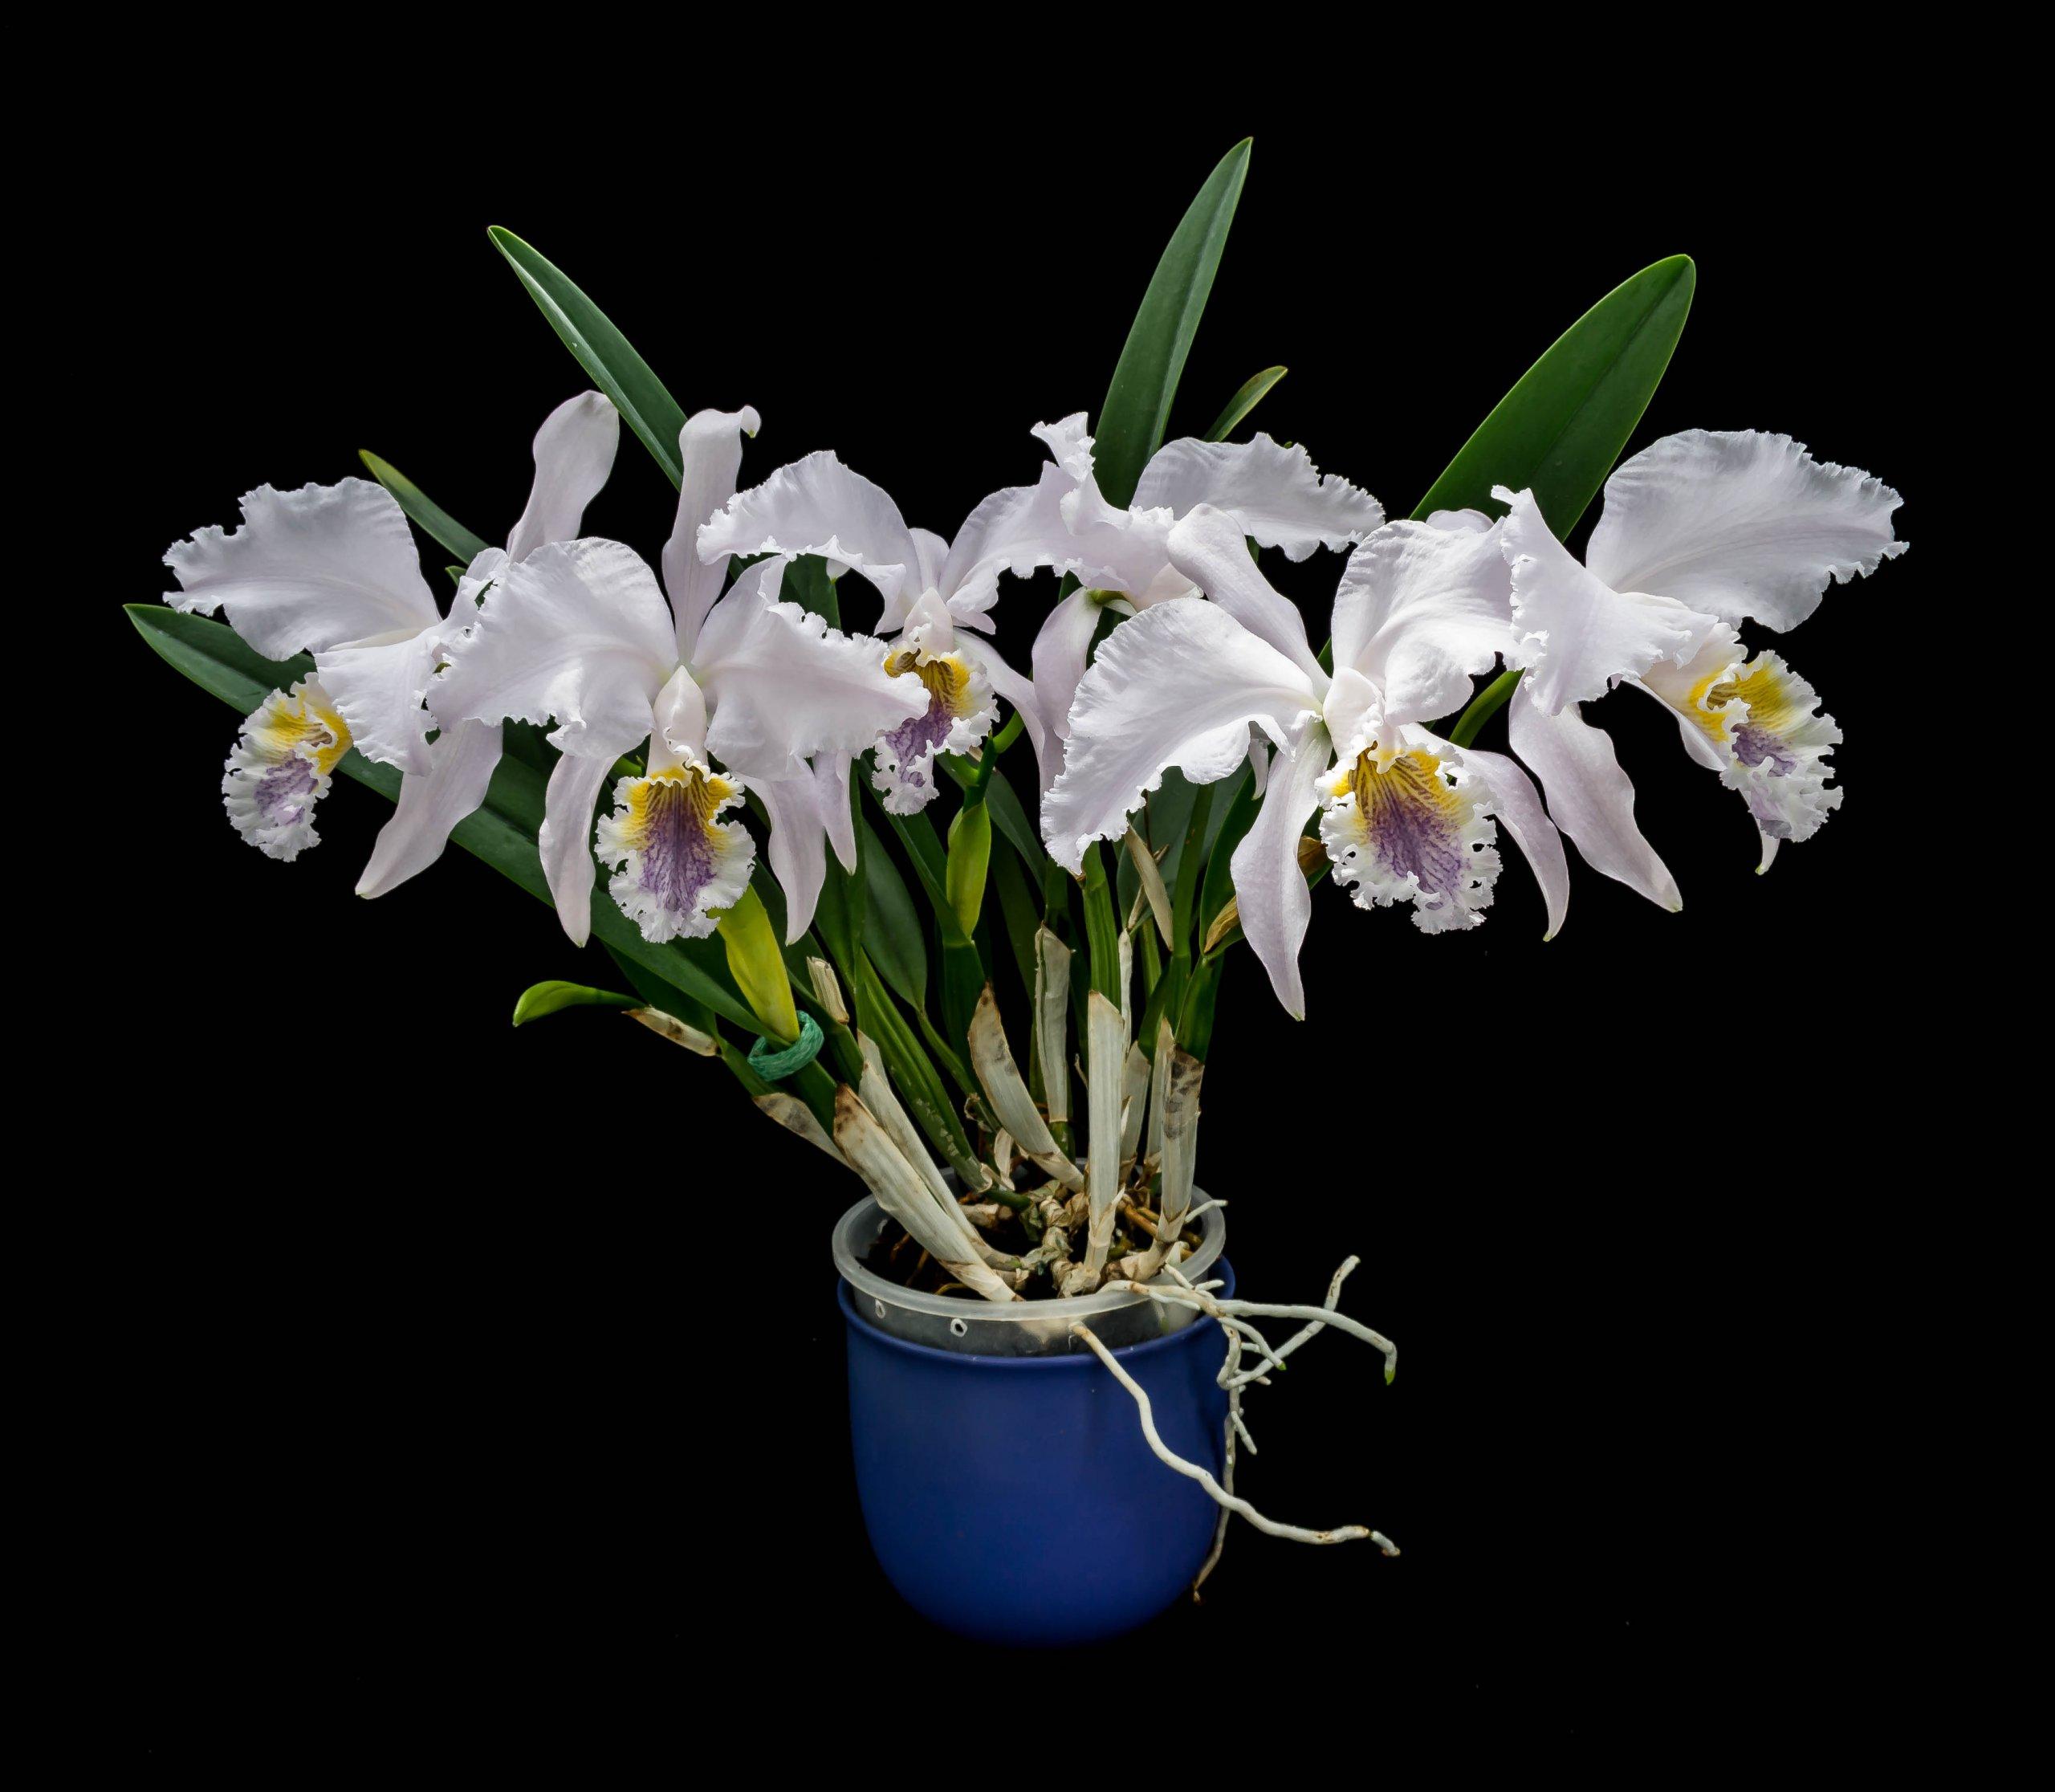 16052021 Cattleya mossiae var. coerulea 2 (1).jpg